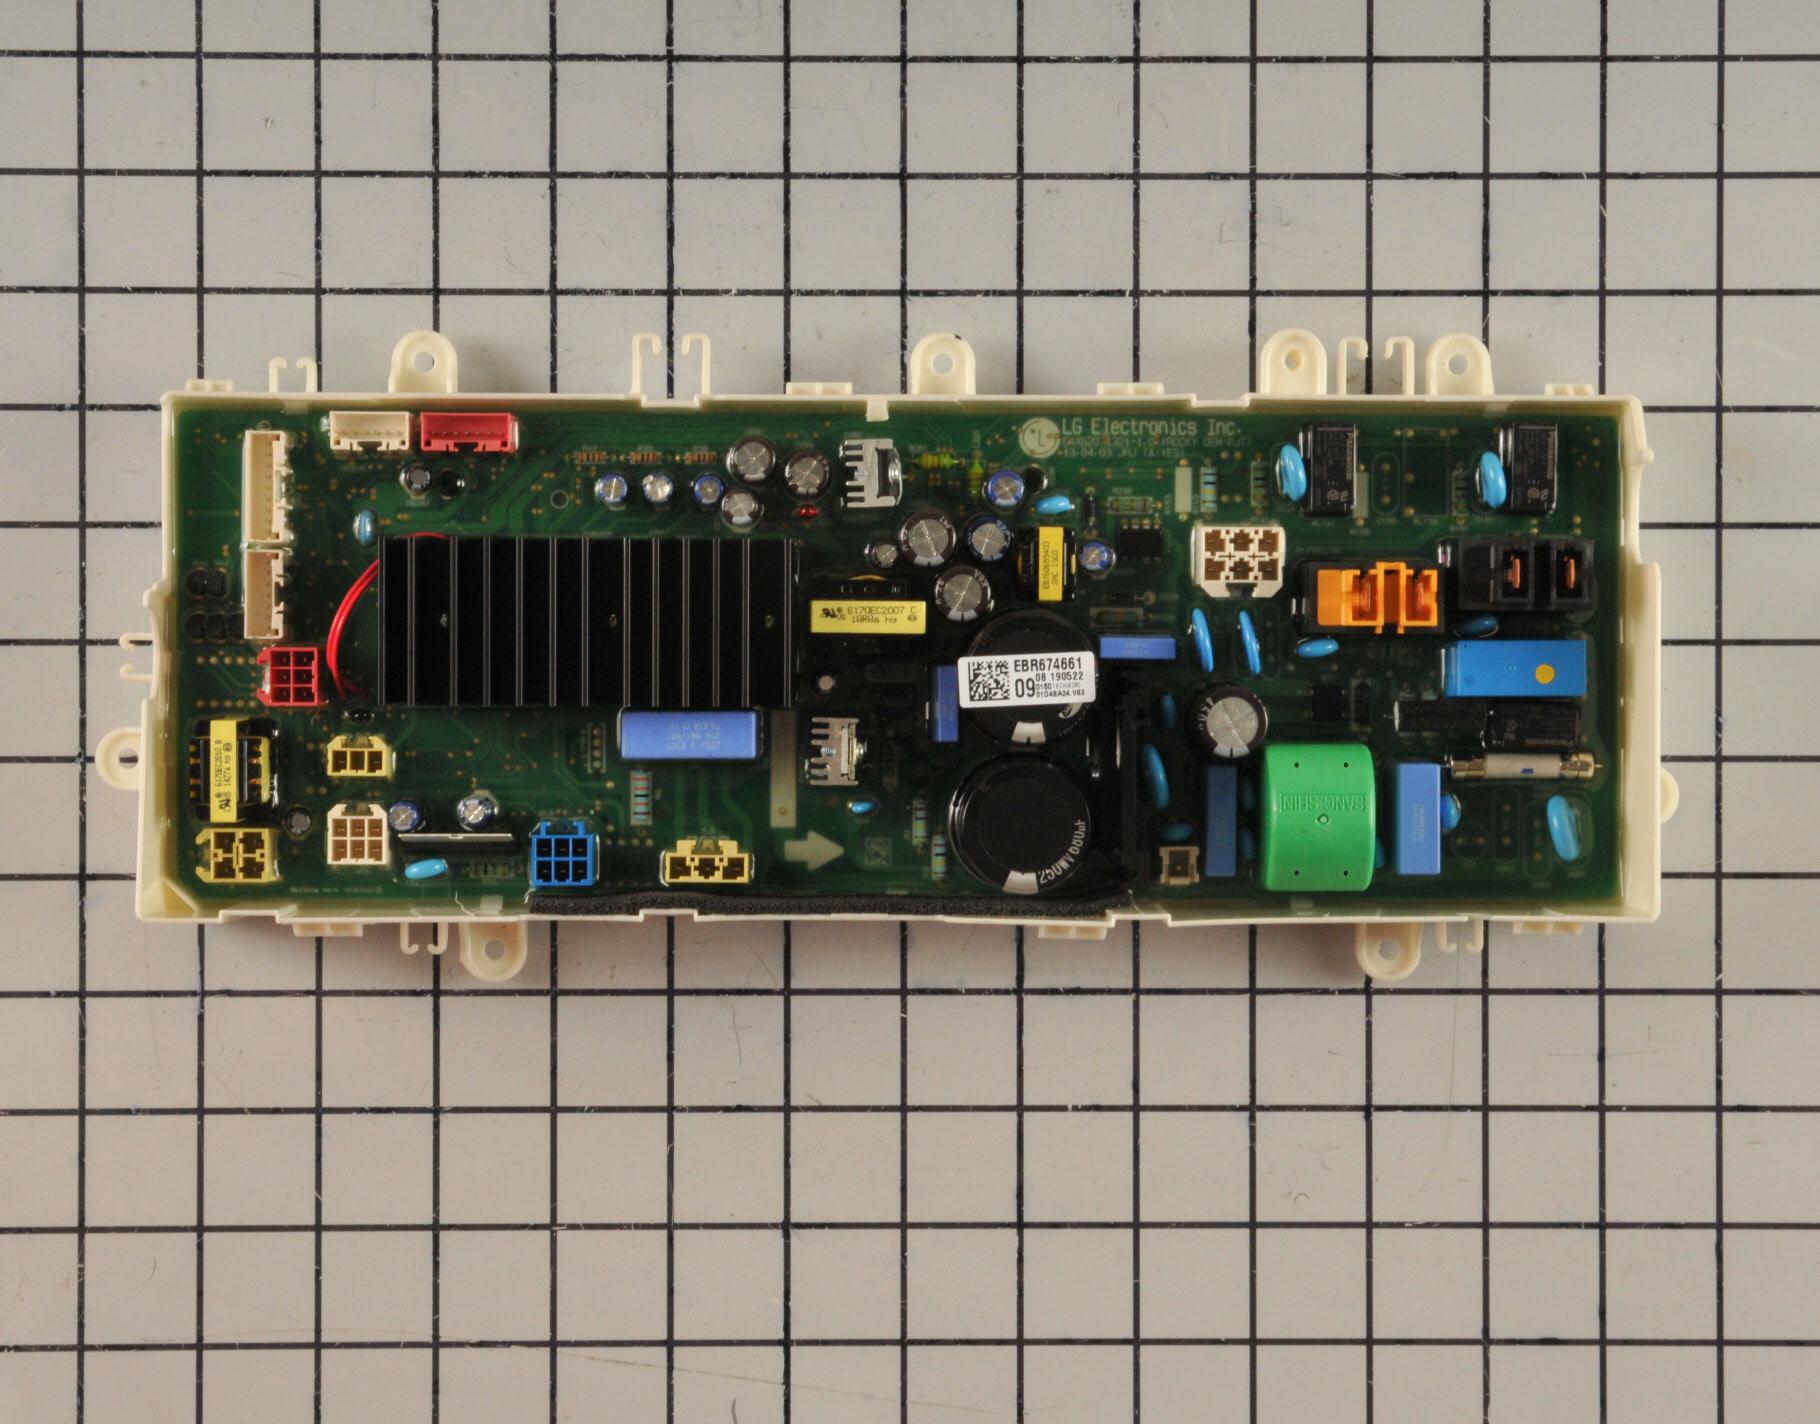 LG Washing Machine Part # EBR67466109 - Main Control Board